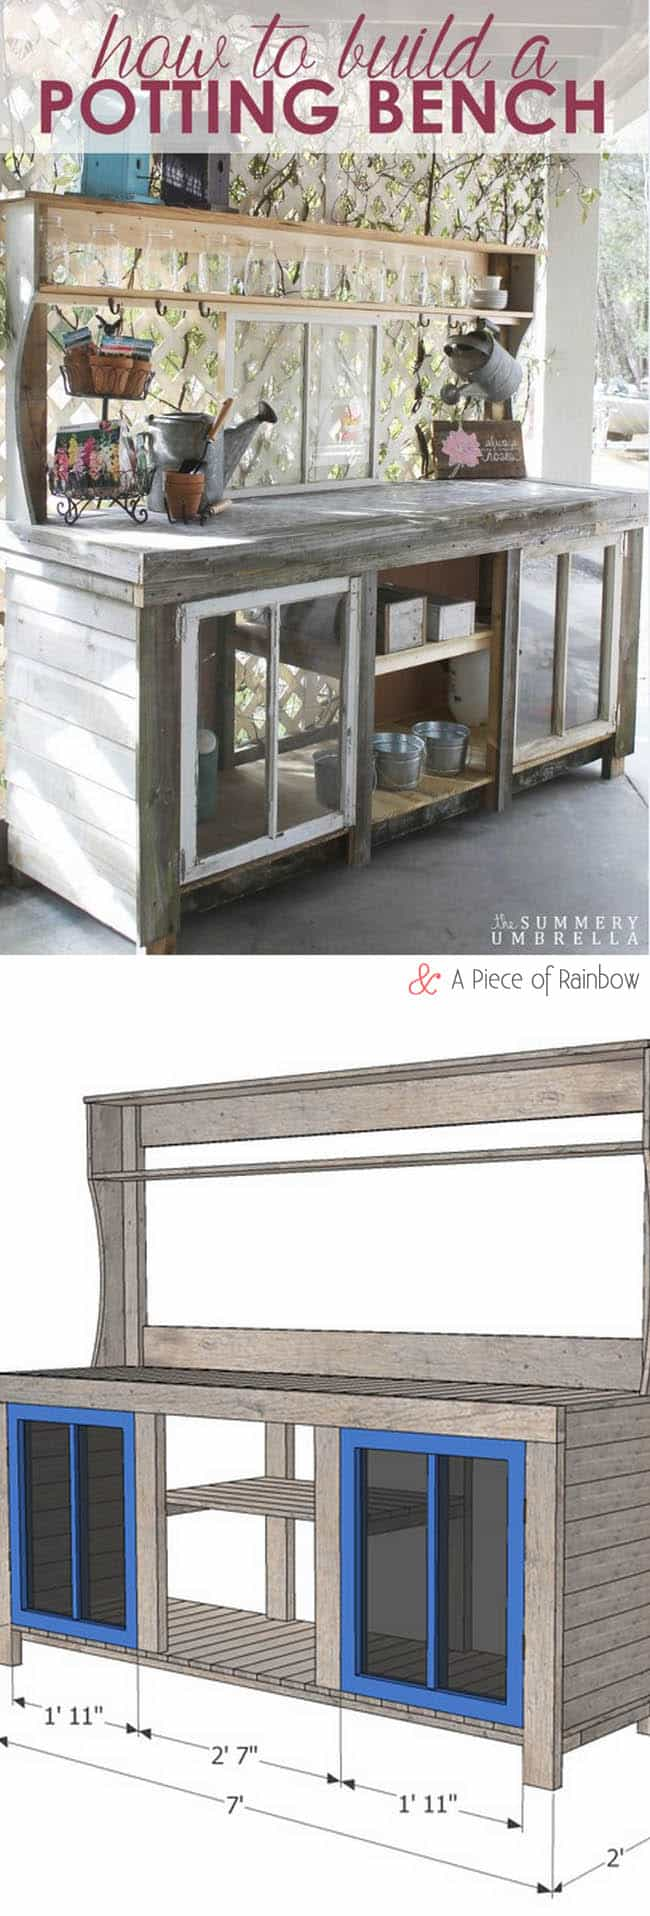 Wondrous Reclaimed Window Potting Bench A Piece Of Rainbow Ibusinesslaw Wood Chair Design Ideas Ibusinesslaworg